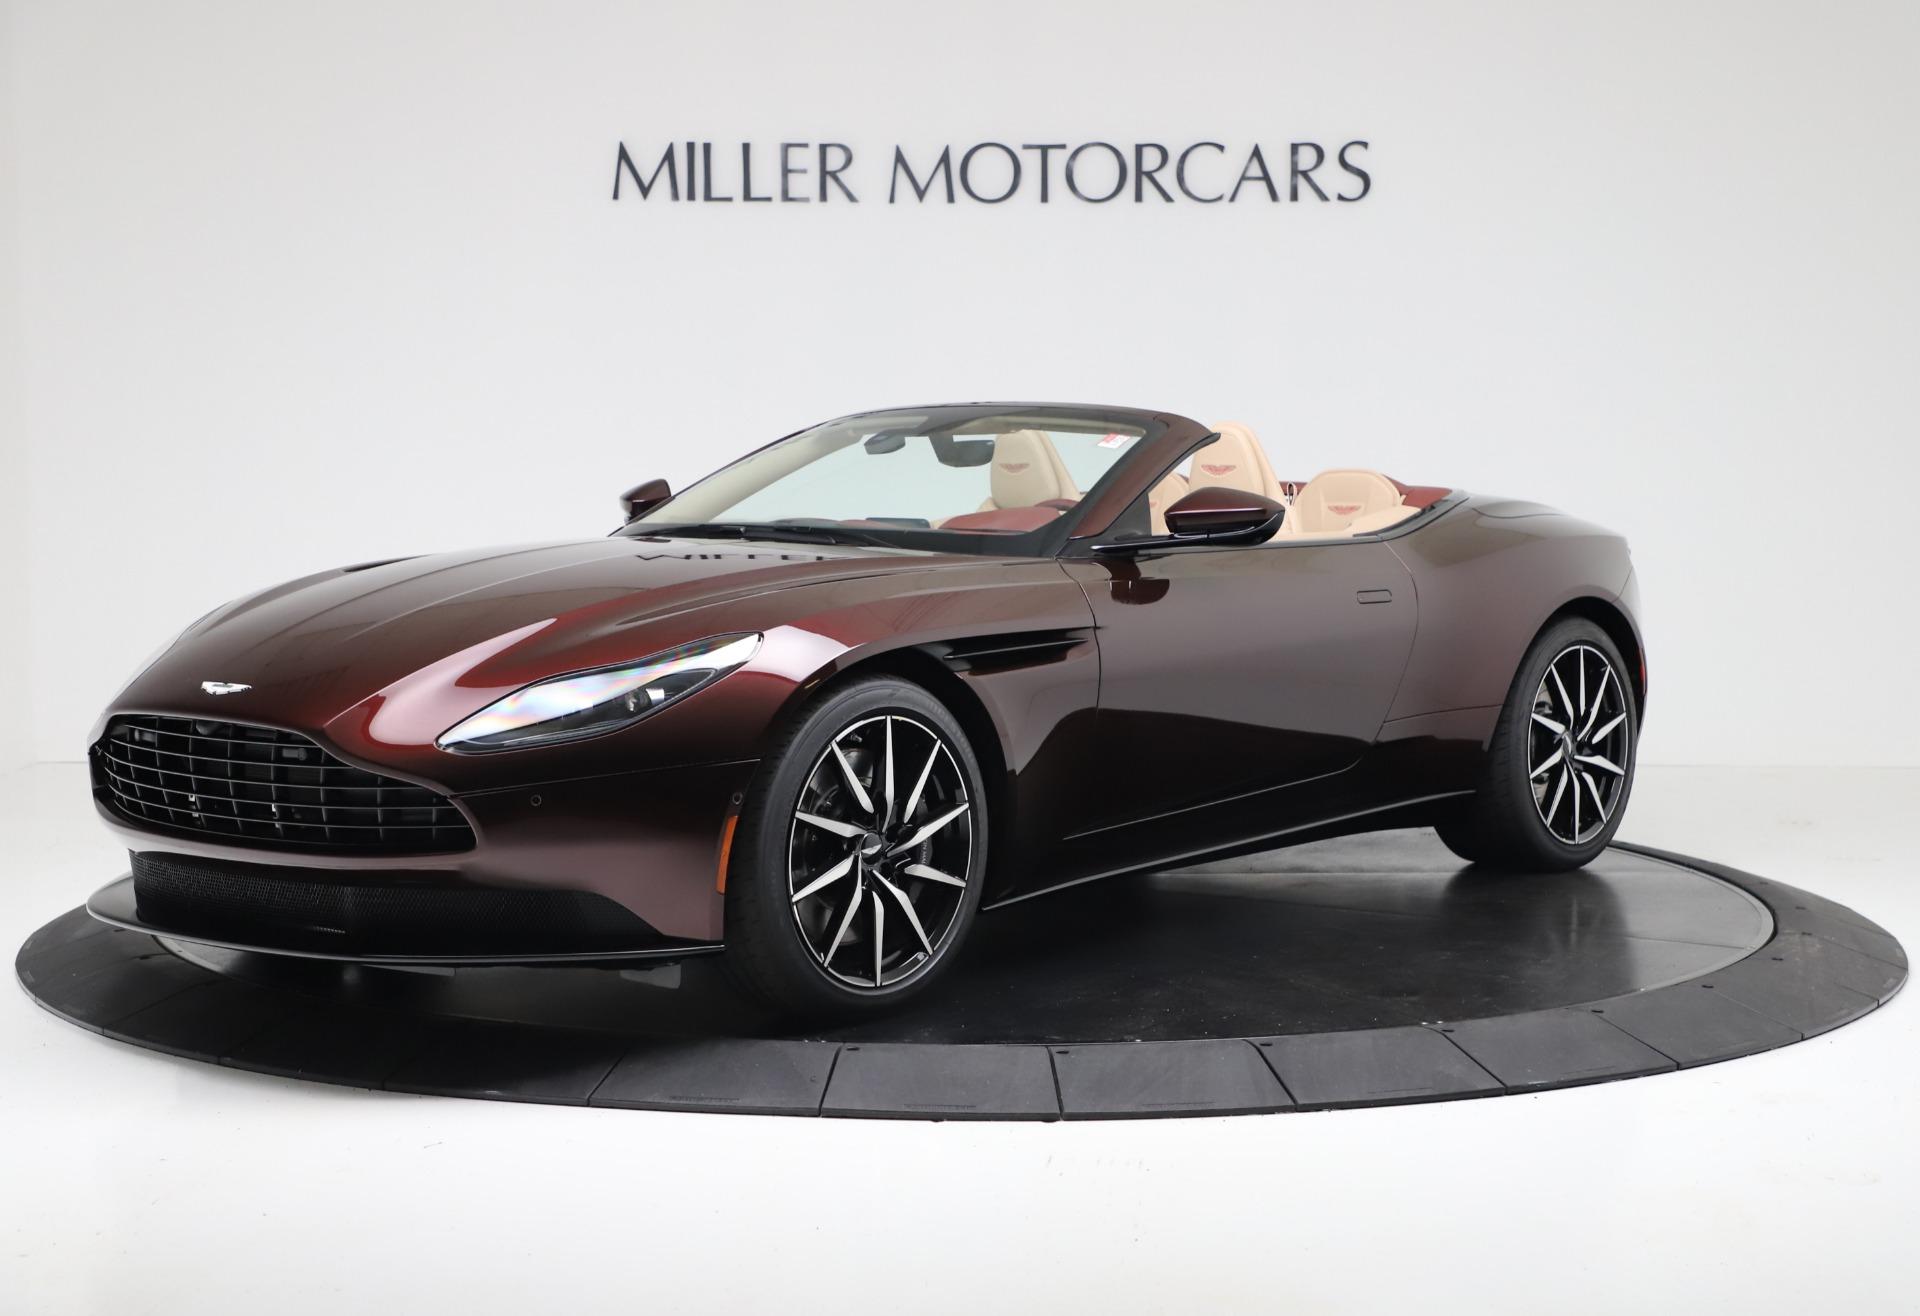 Used 2020 Aston Martin DB11 Volante Convertible for sale Sold at Alfa Romeo of Greenwich in Greenwich CT 06830 1